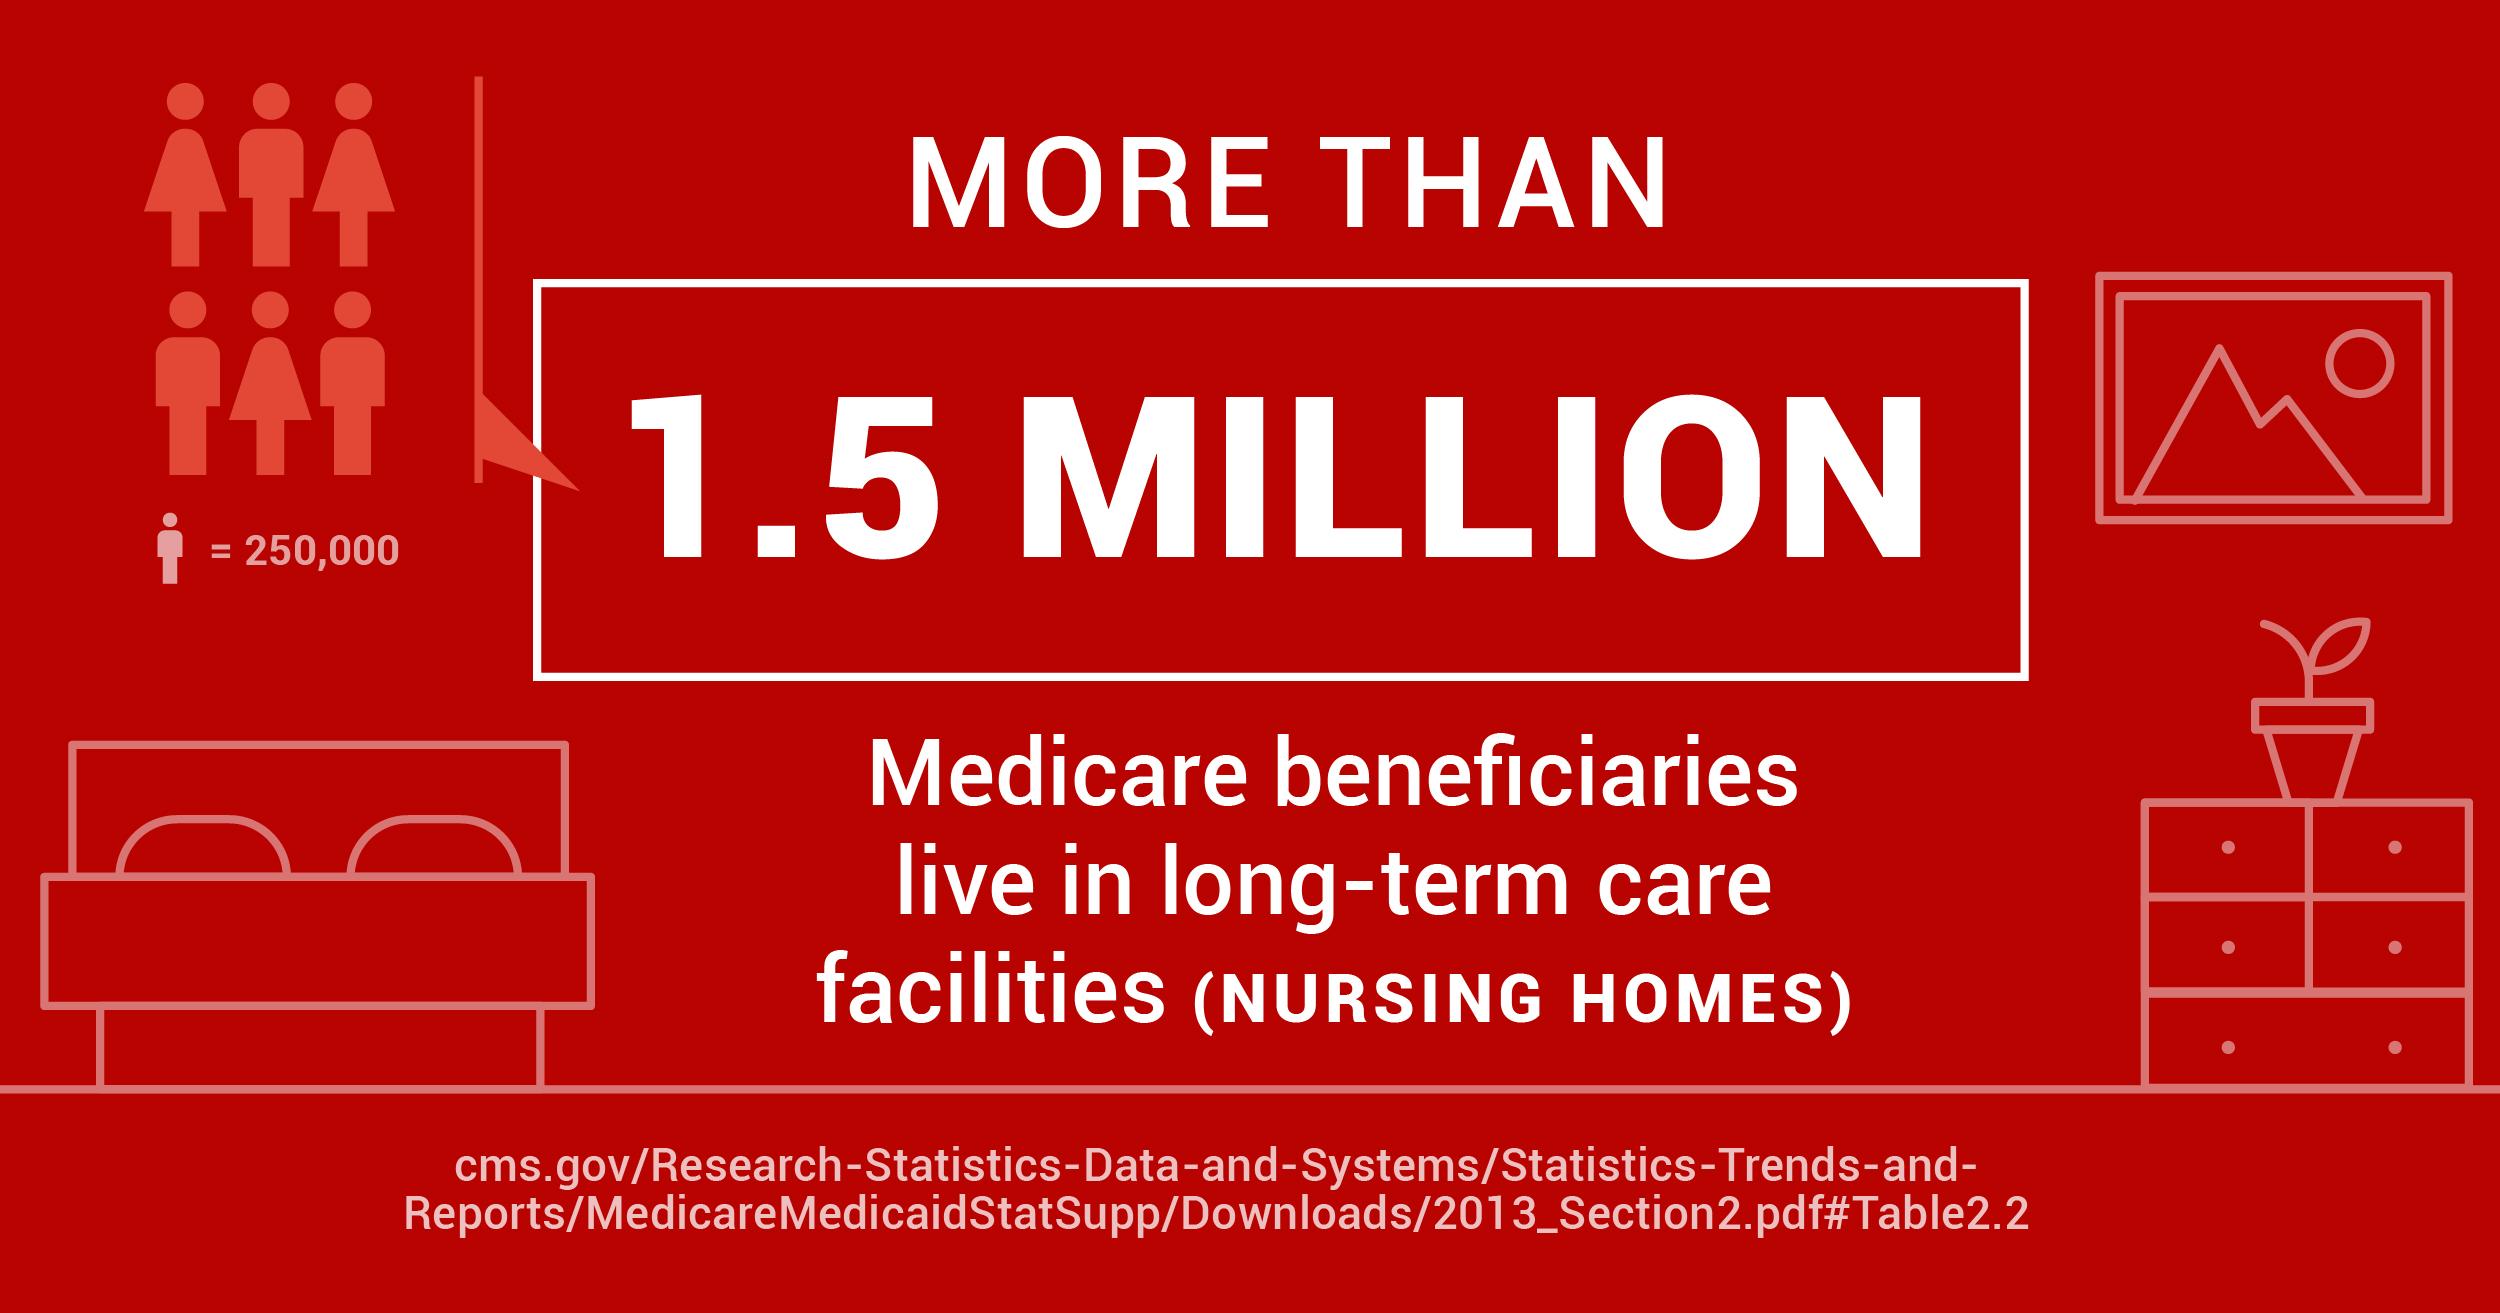 CMA Save Medicare Graphics r3 17-0303-04.jpg